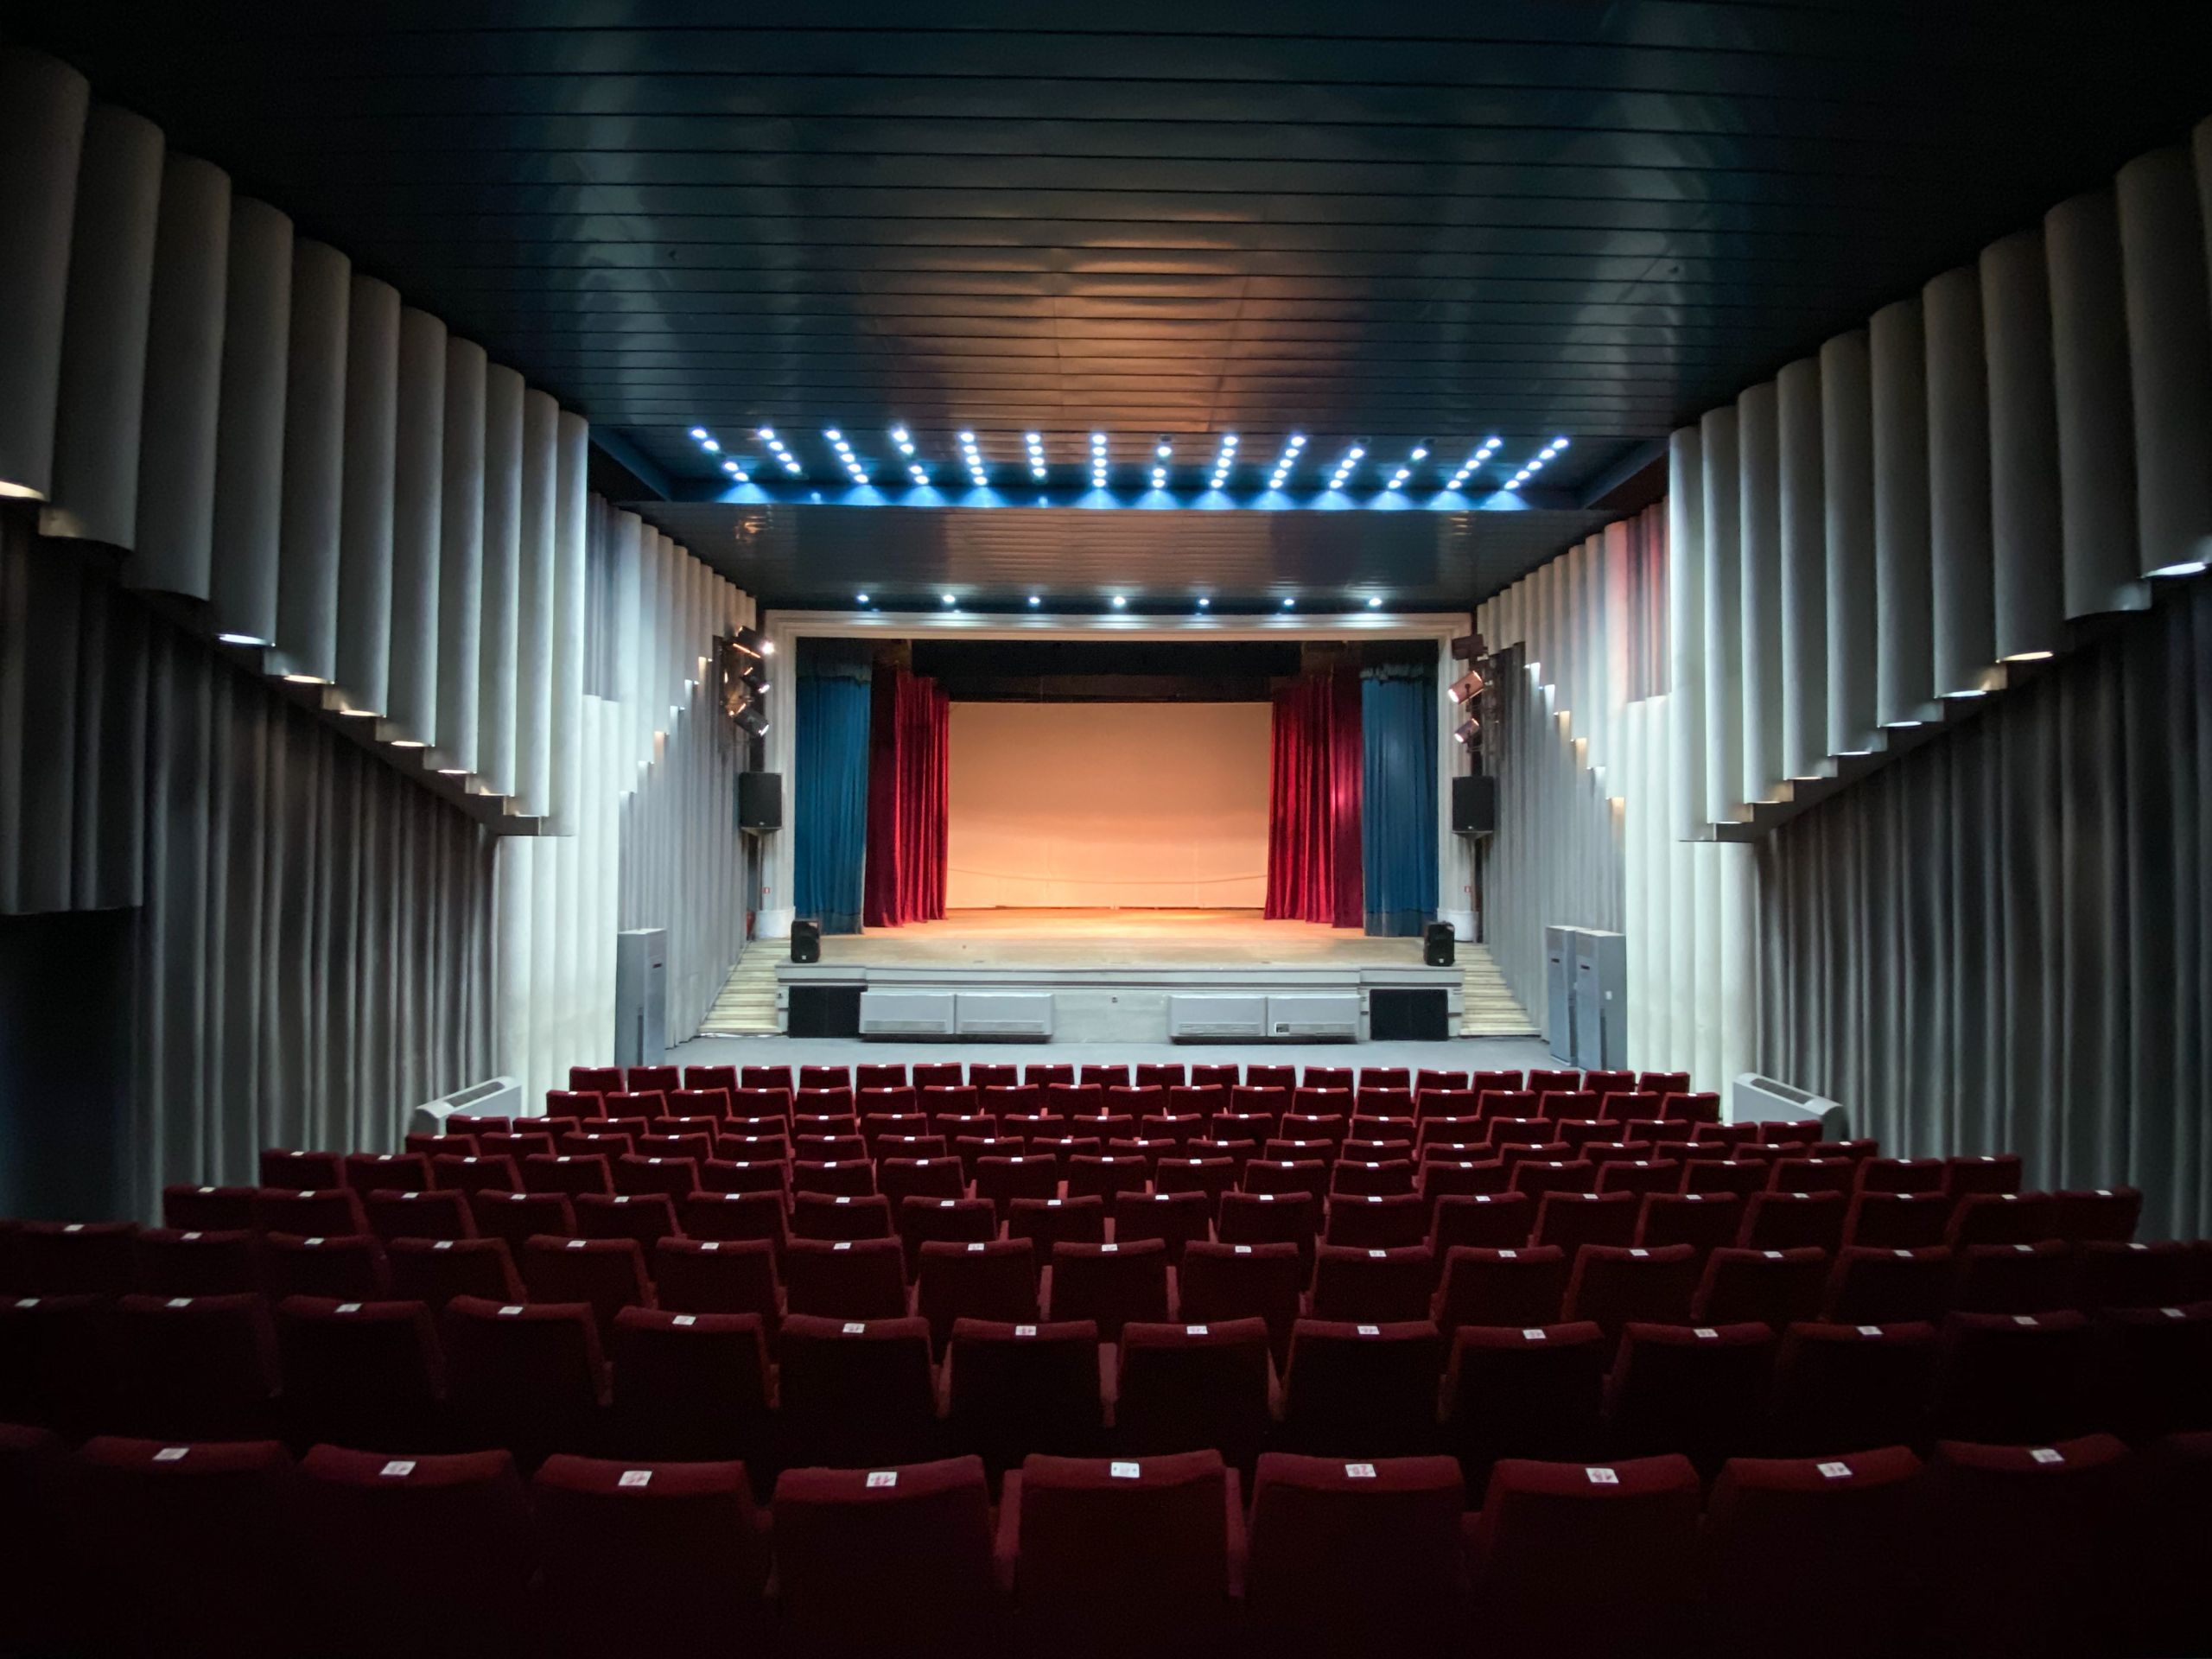 Kino Teatur Osvobojdenie 17